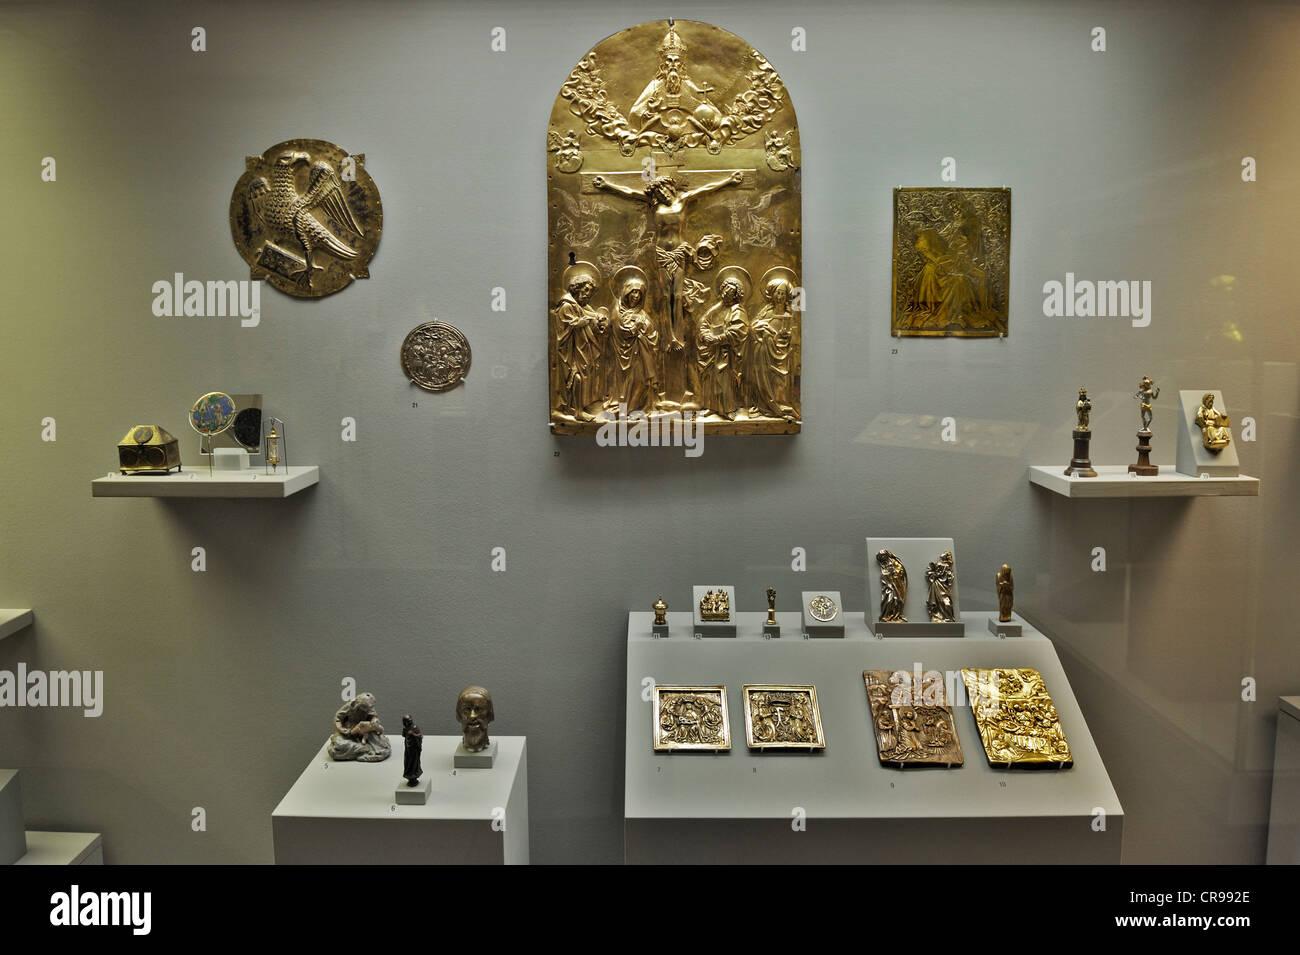 Medieval art treasures, religious jewelry and measuring utensils, Bavarian National Museum, Prinzregentenstrasse - Stock Image